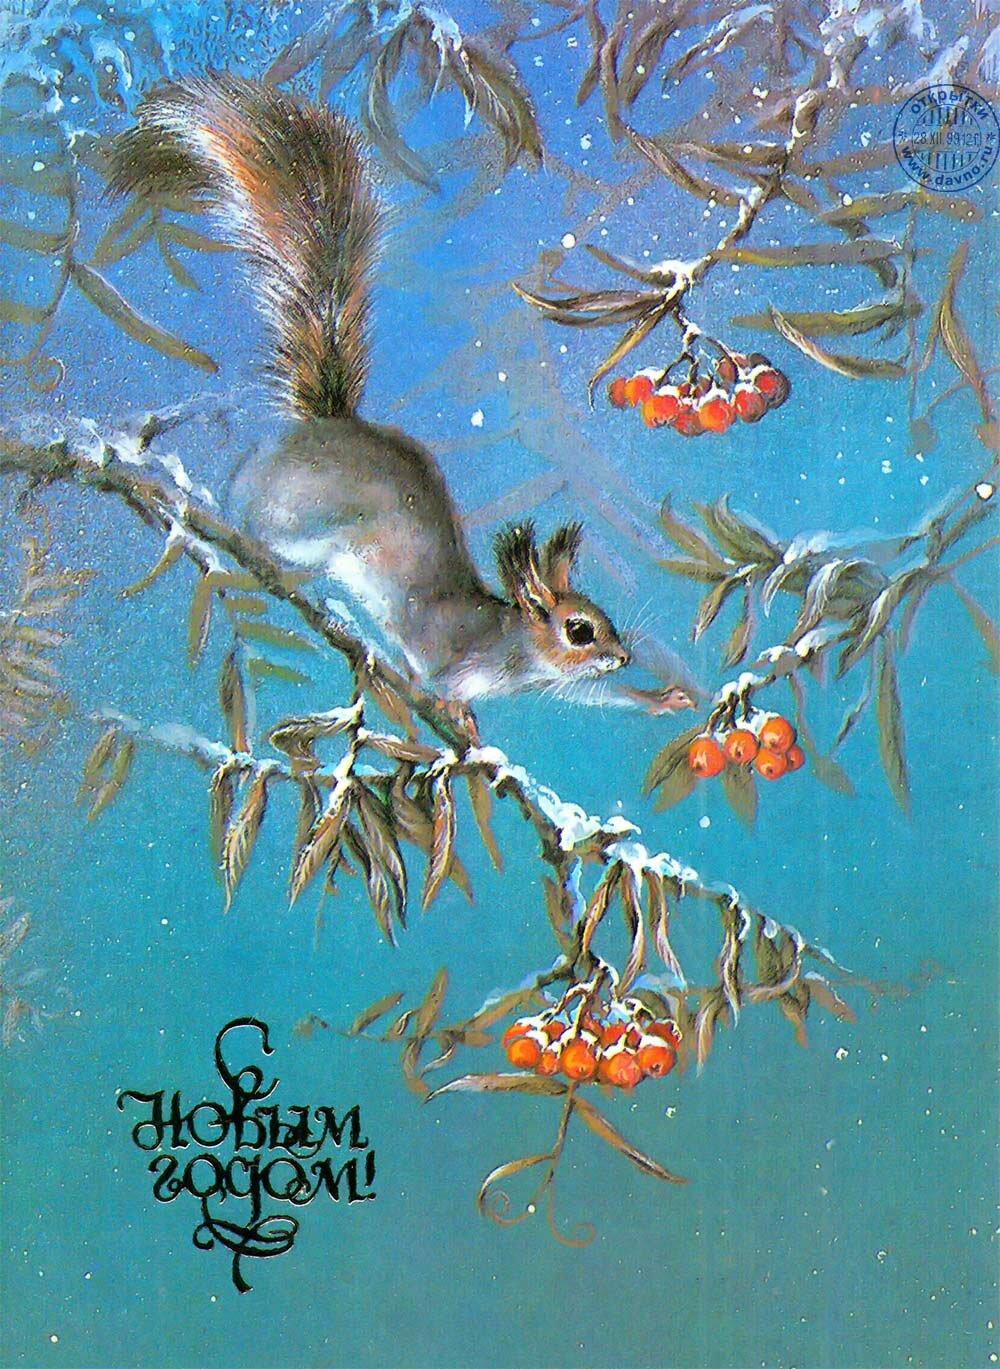 Худ исаков открытки